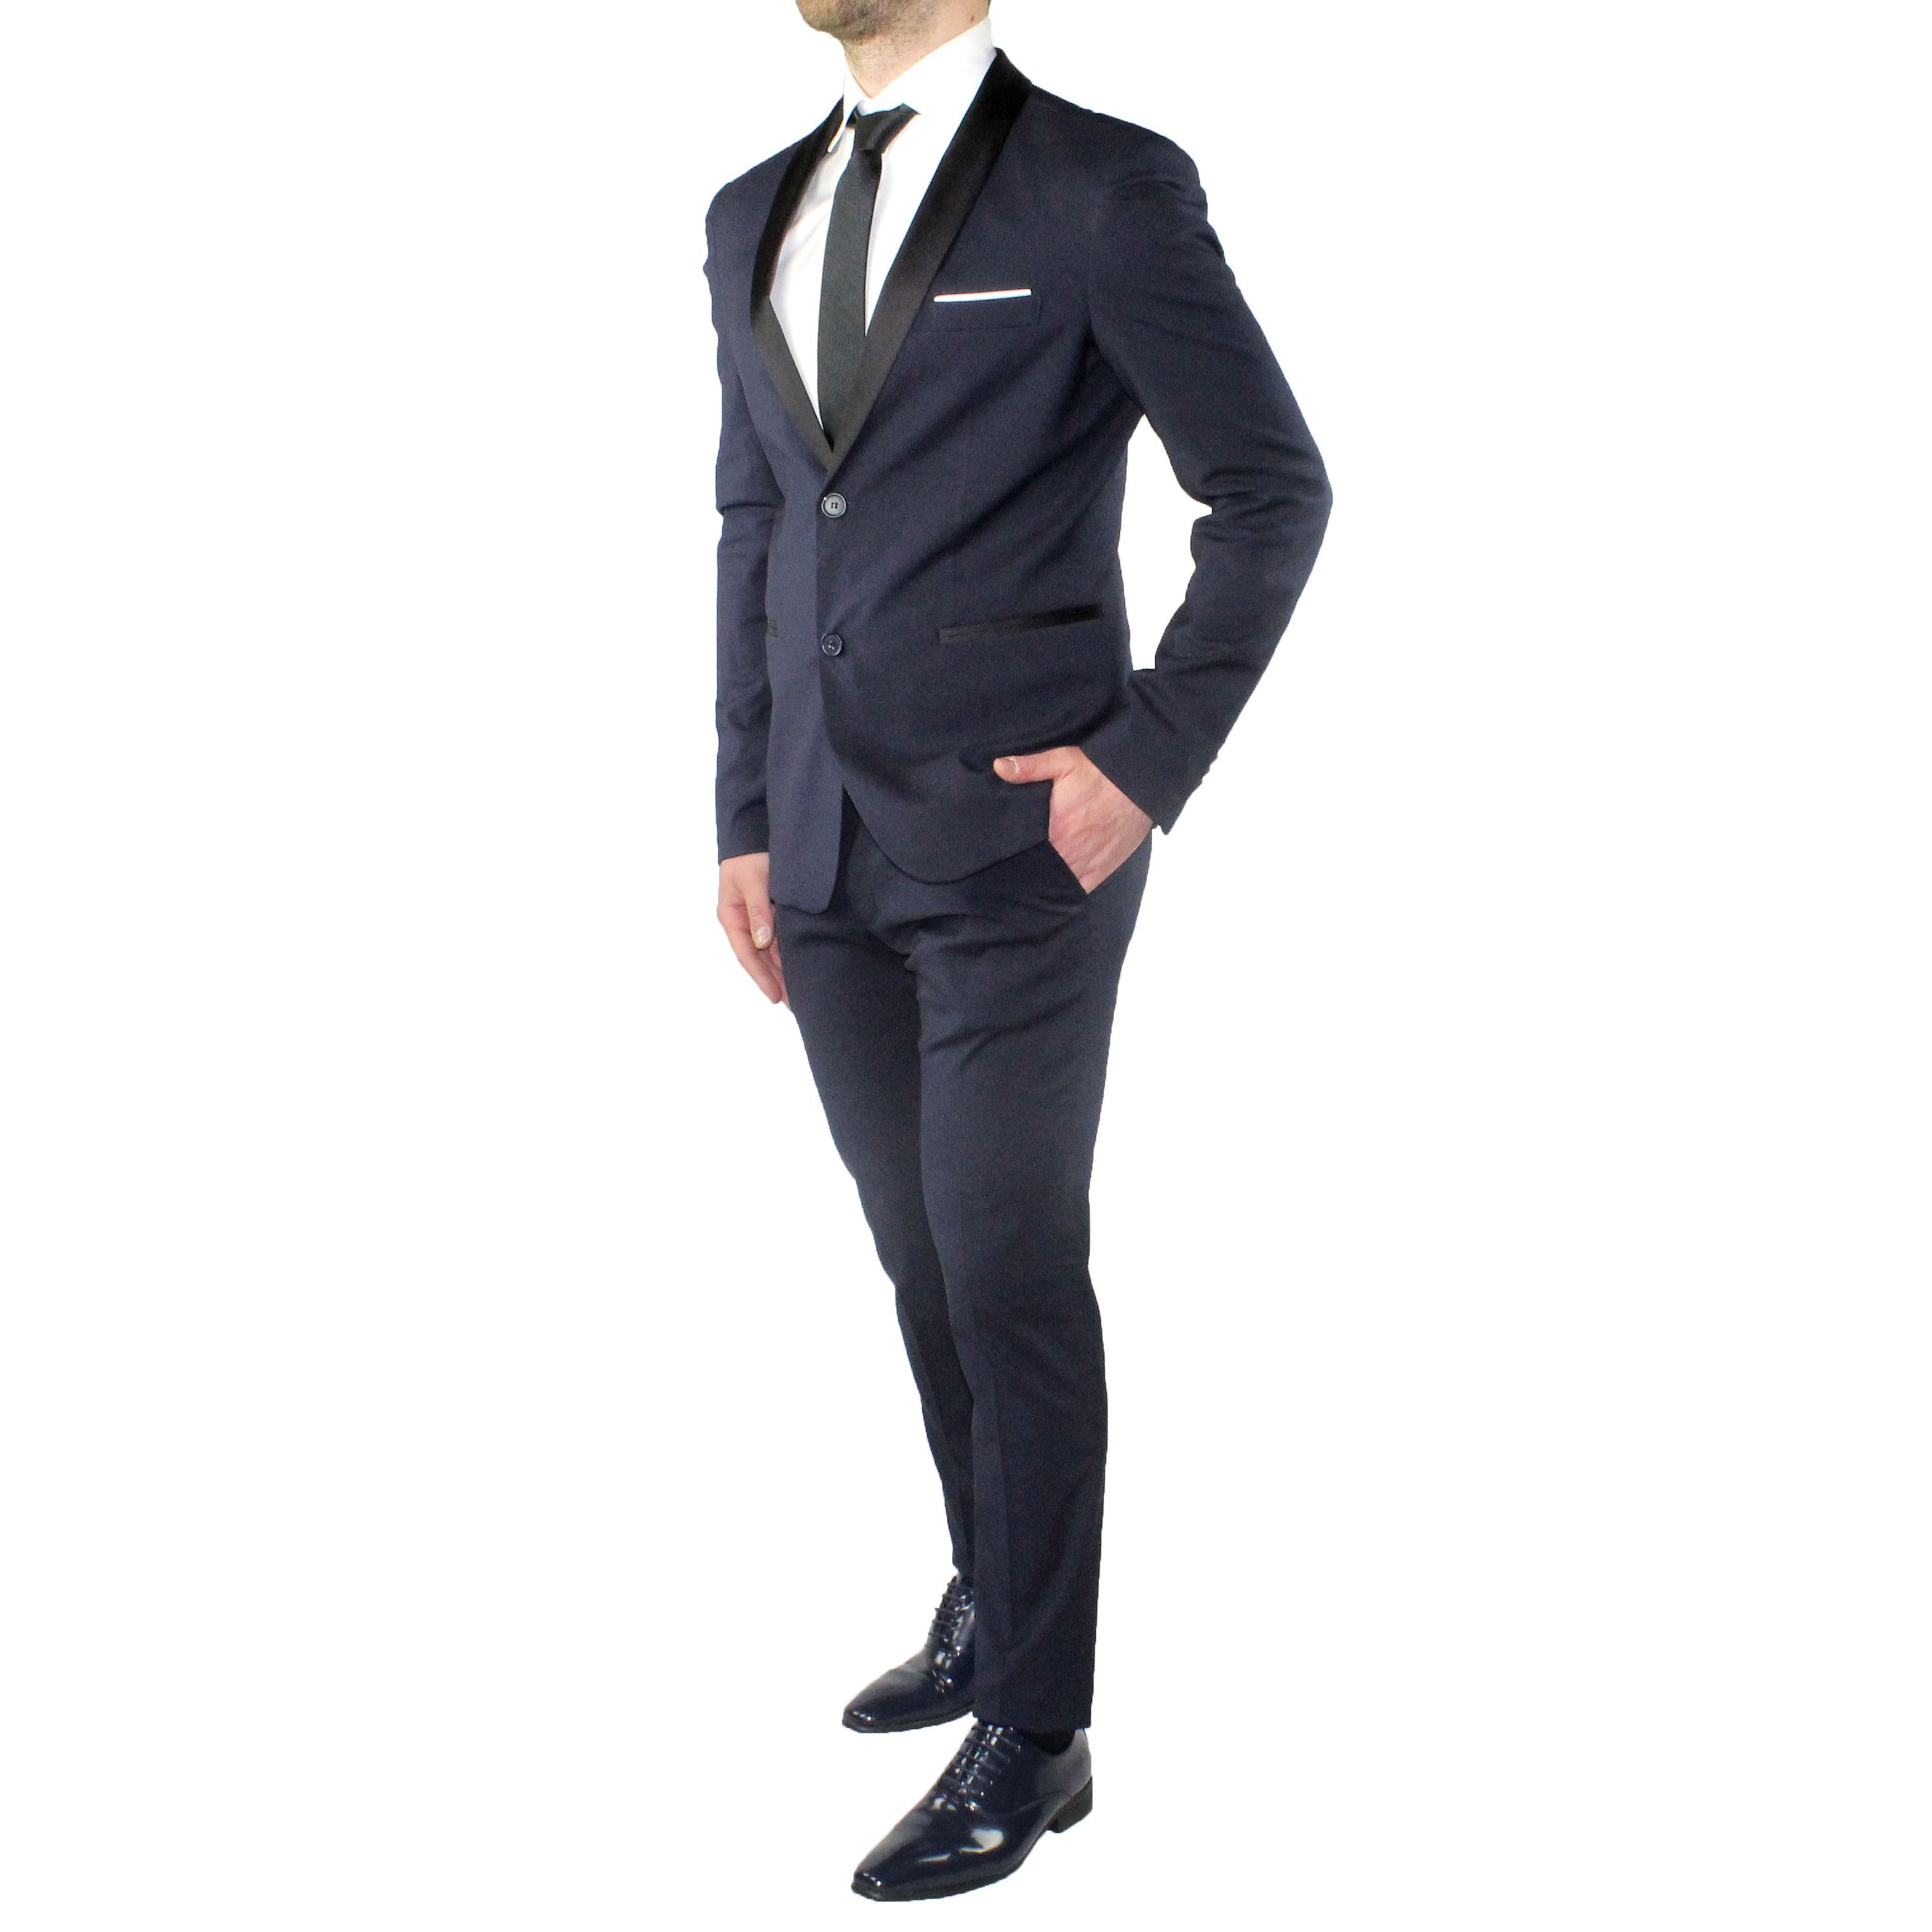 Abito-Uomo-Smoking-Elegante-Vestito-Completo-Estivo-Cerimonia-Sartoriale-Slim miniatura 6